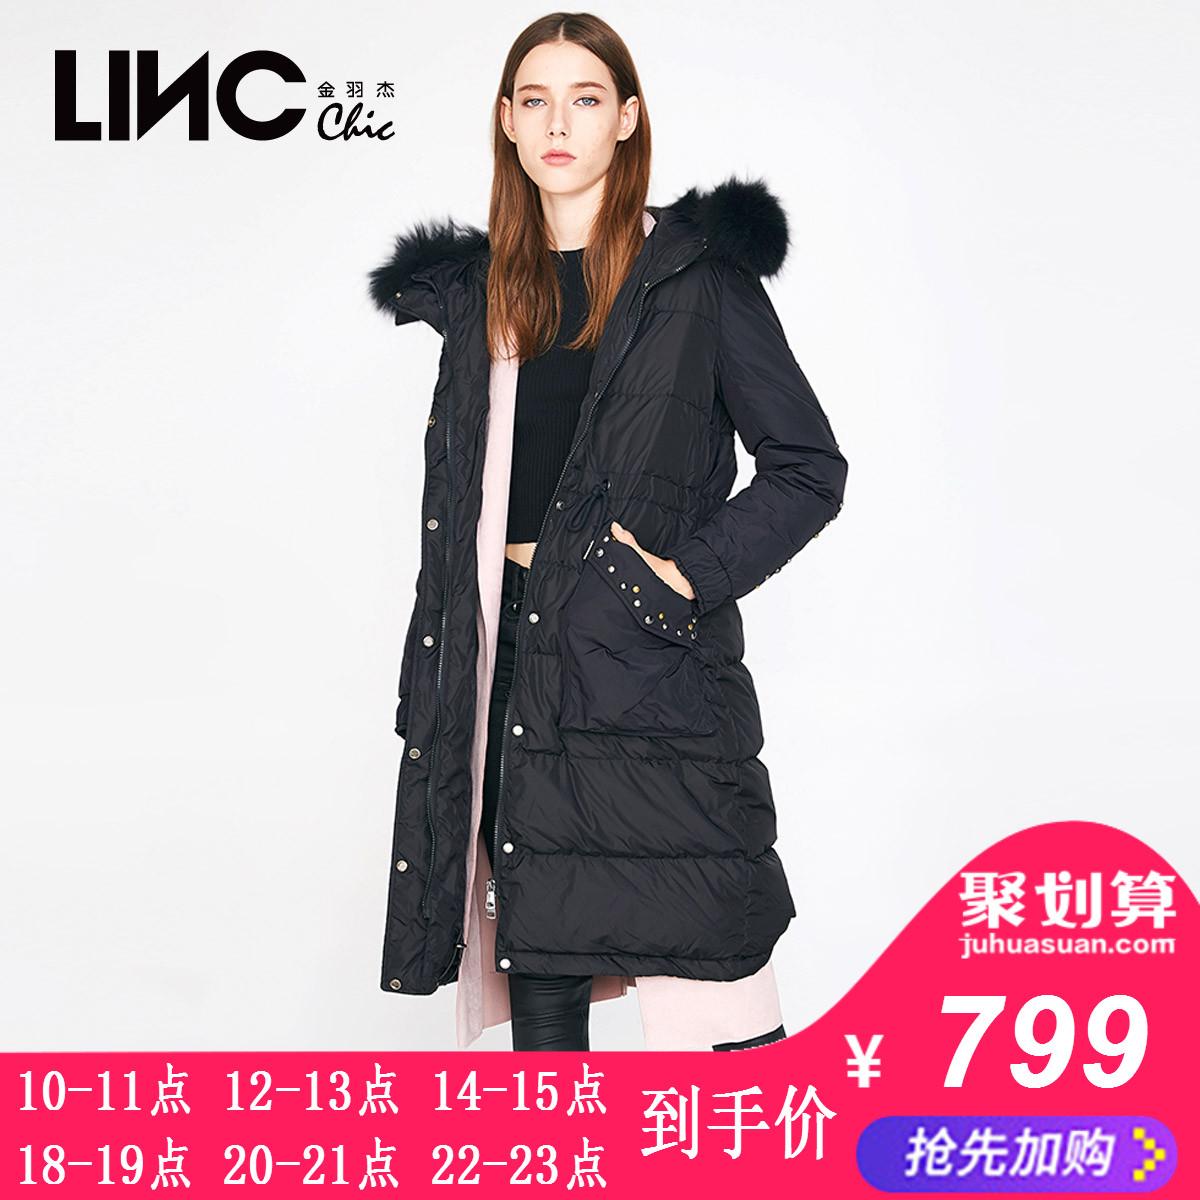 LINC金羽杰貉子大毛领羽绒服中长款冬季新款女修身外套7470969